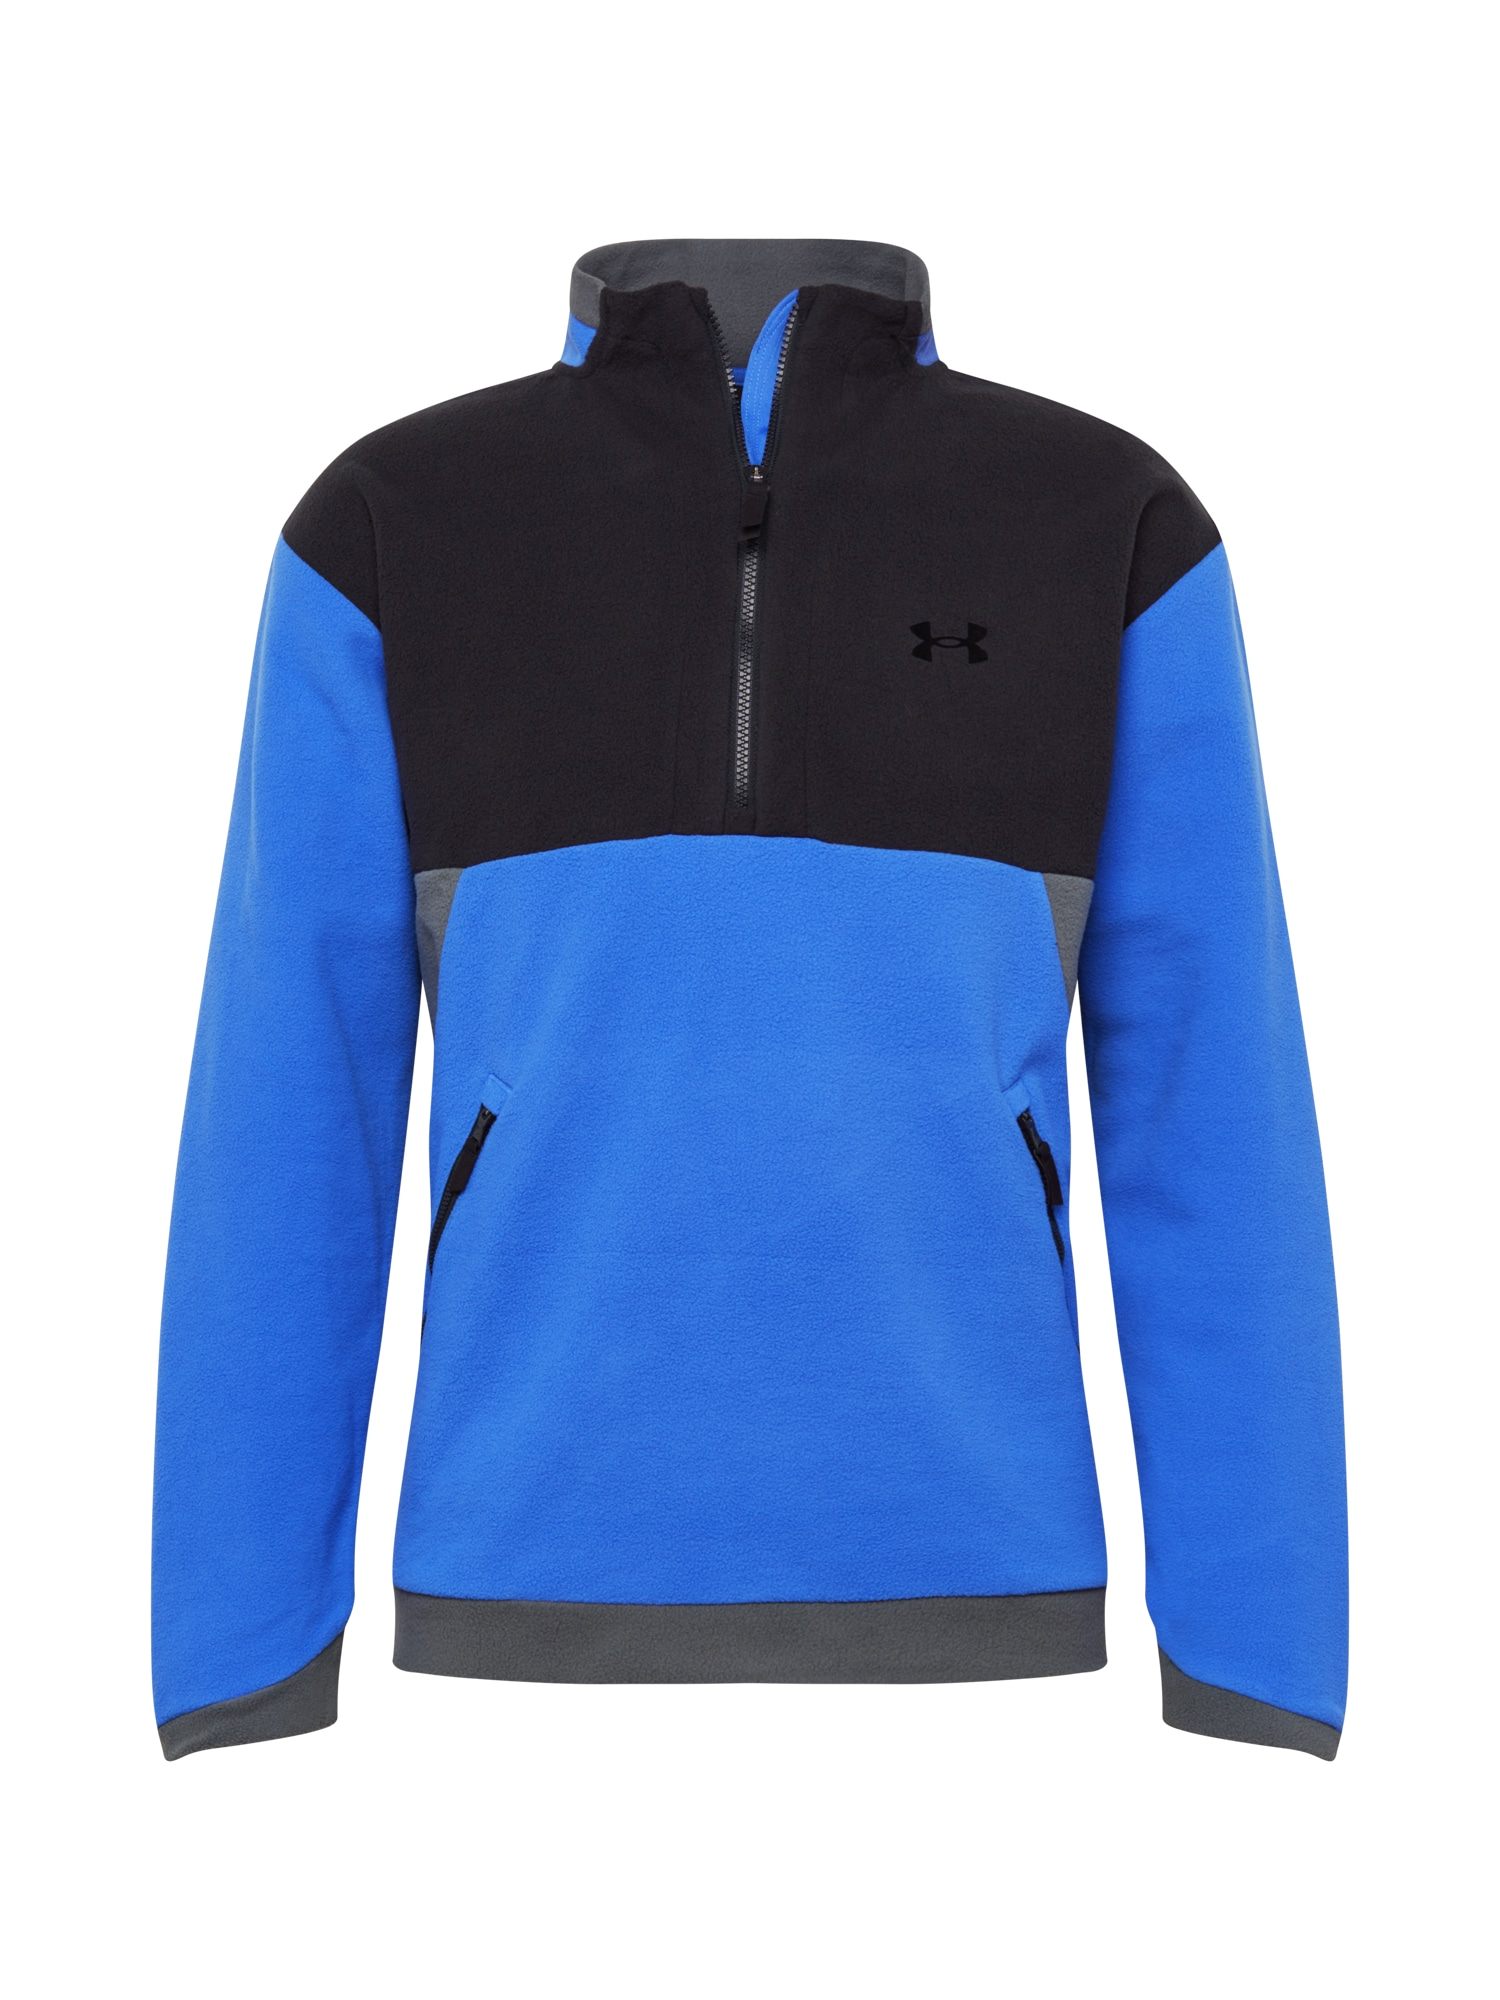 UNDER ARMOUR Sportinio tipo megztinis mėlyna / kobalto mėlyna / pilka